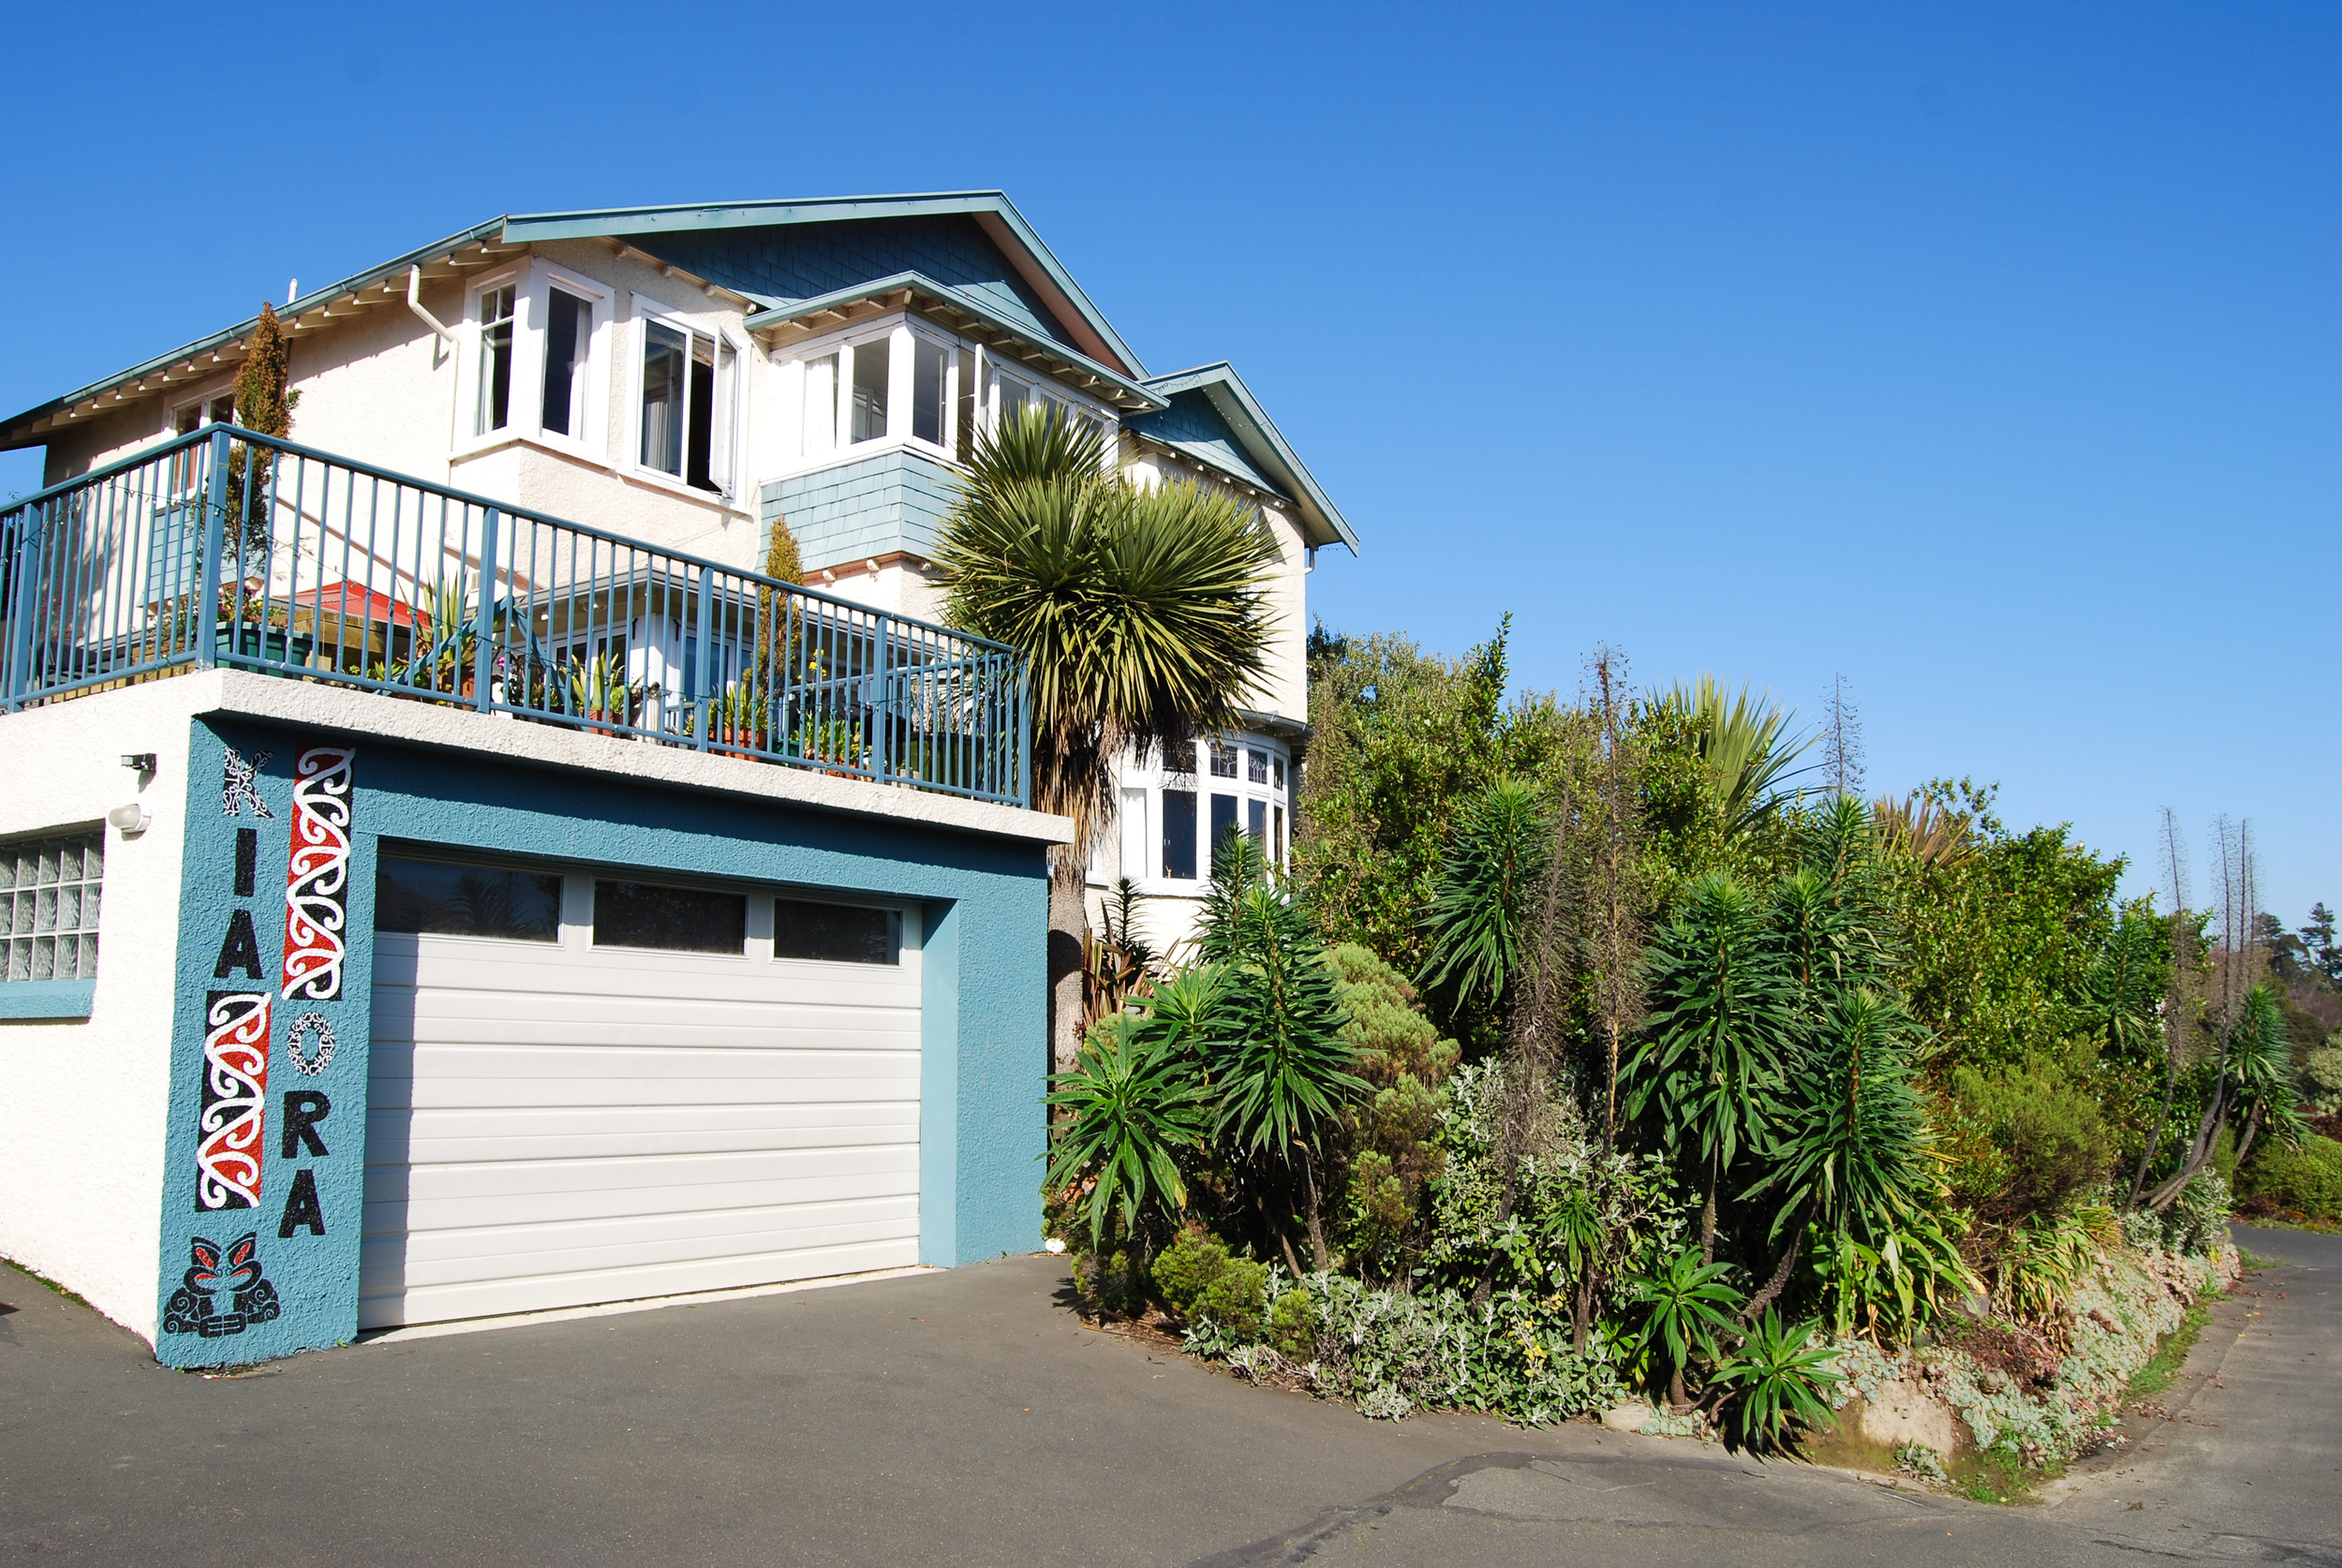 Arden Street House overlooking Dunedin and North East Valley